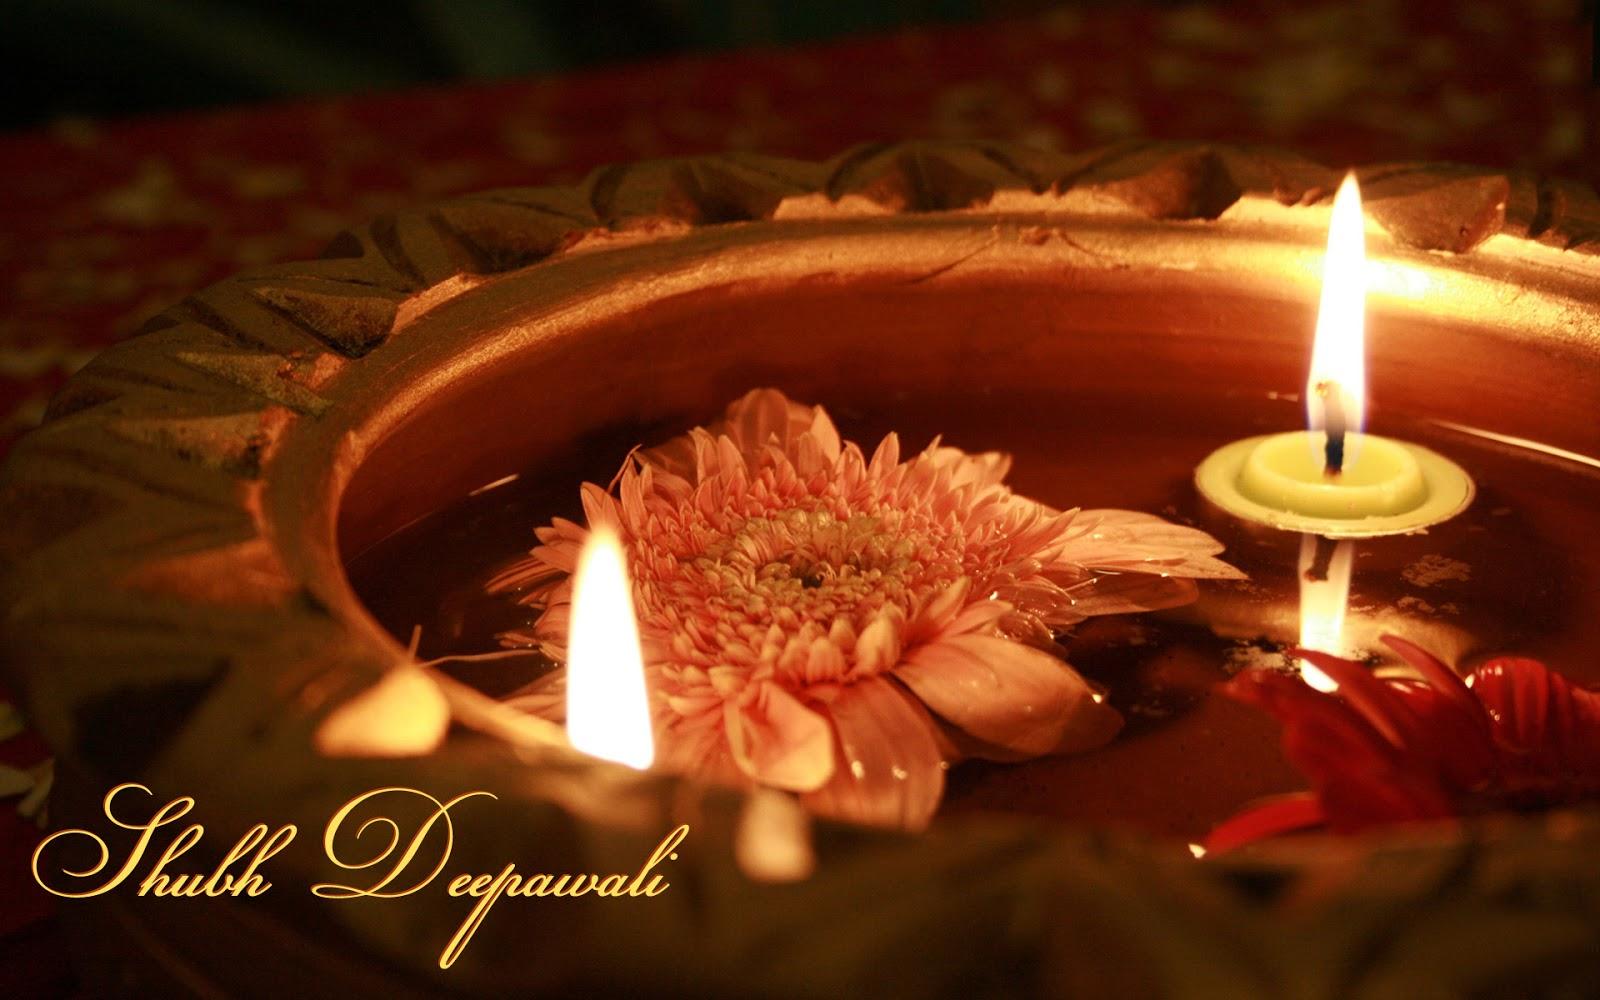 happy diwali 2013: happy diwali wishes - diwali diya hd wallpapers